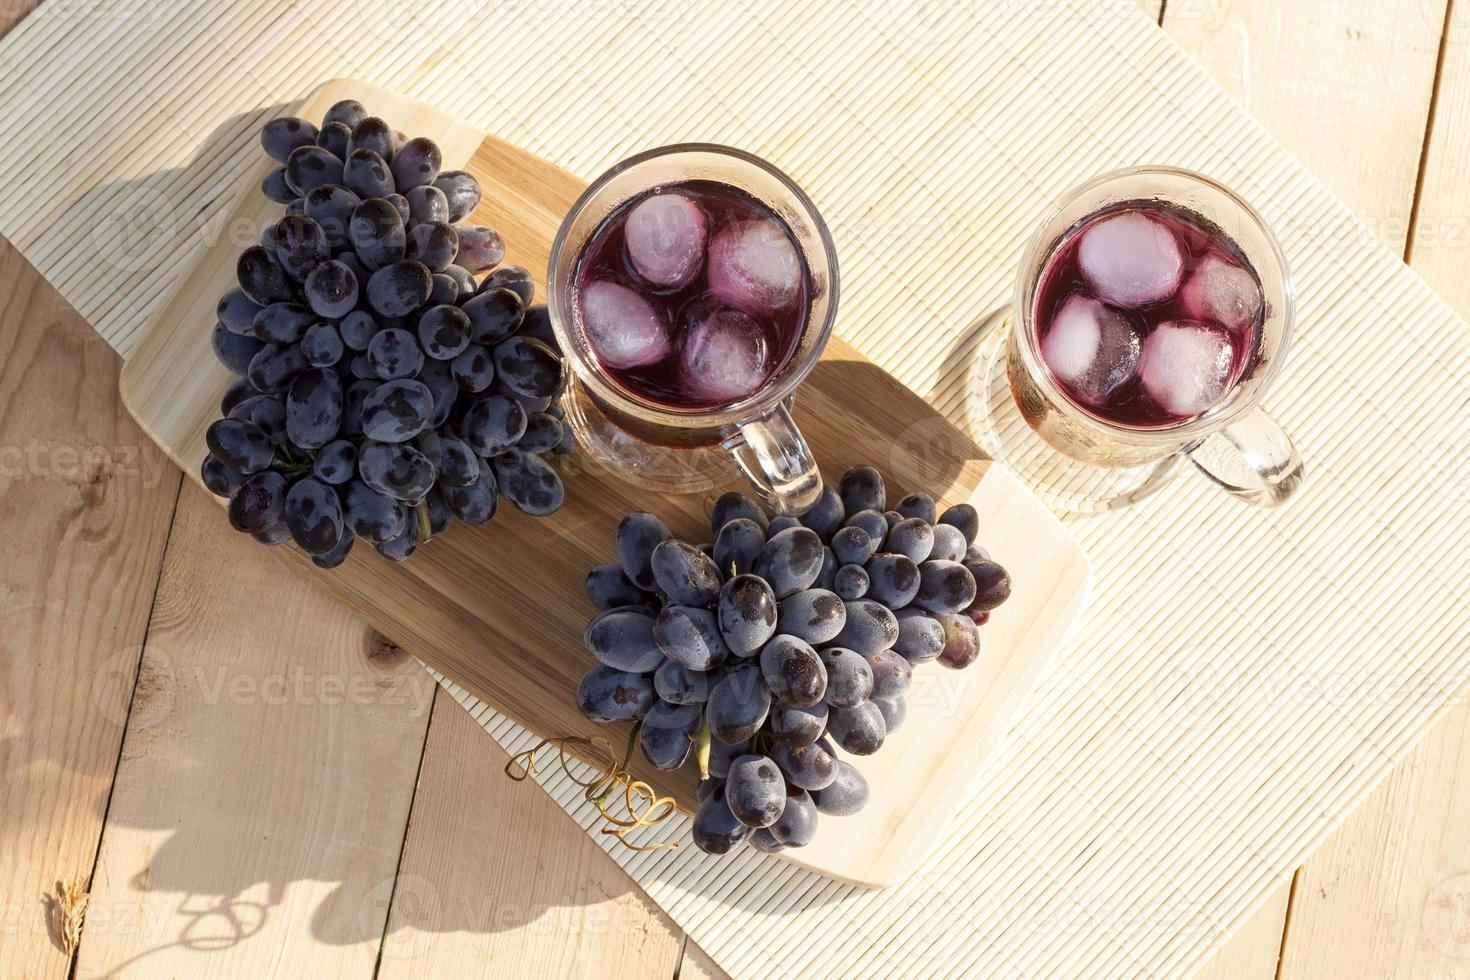 jugo de uva y uvas azules frescas foto